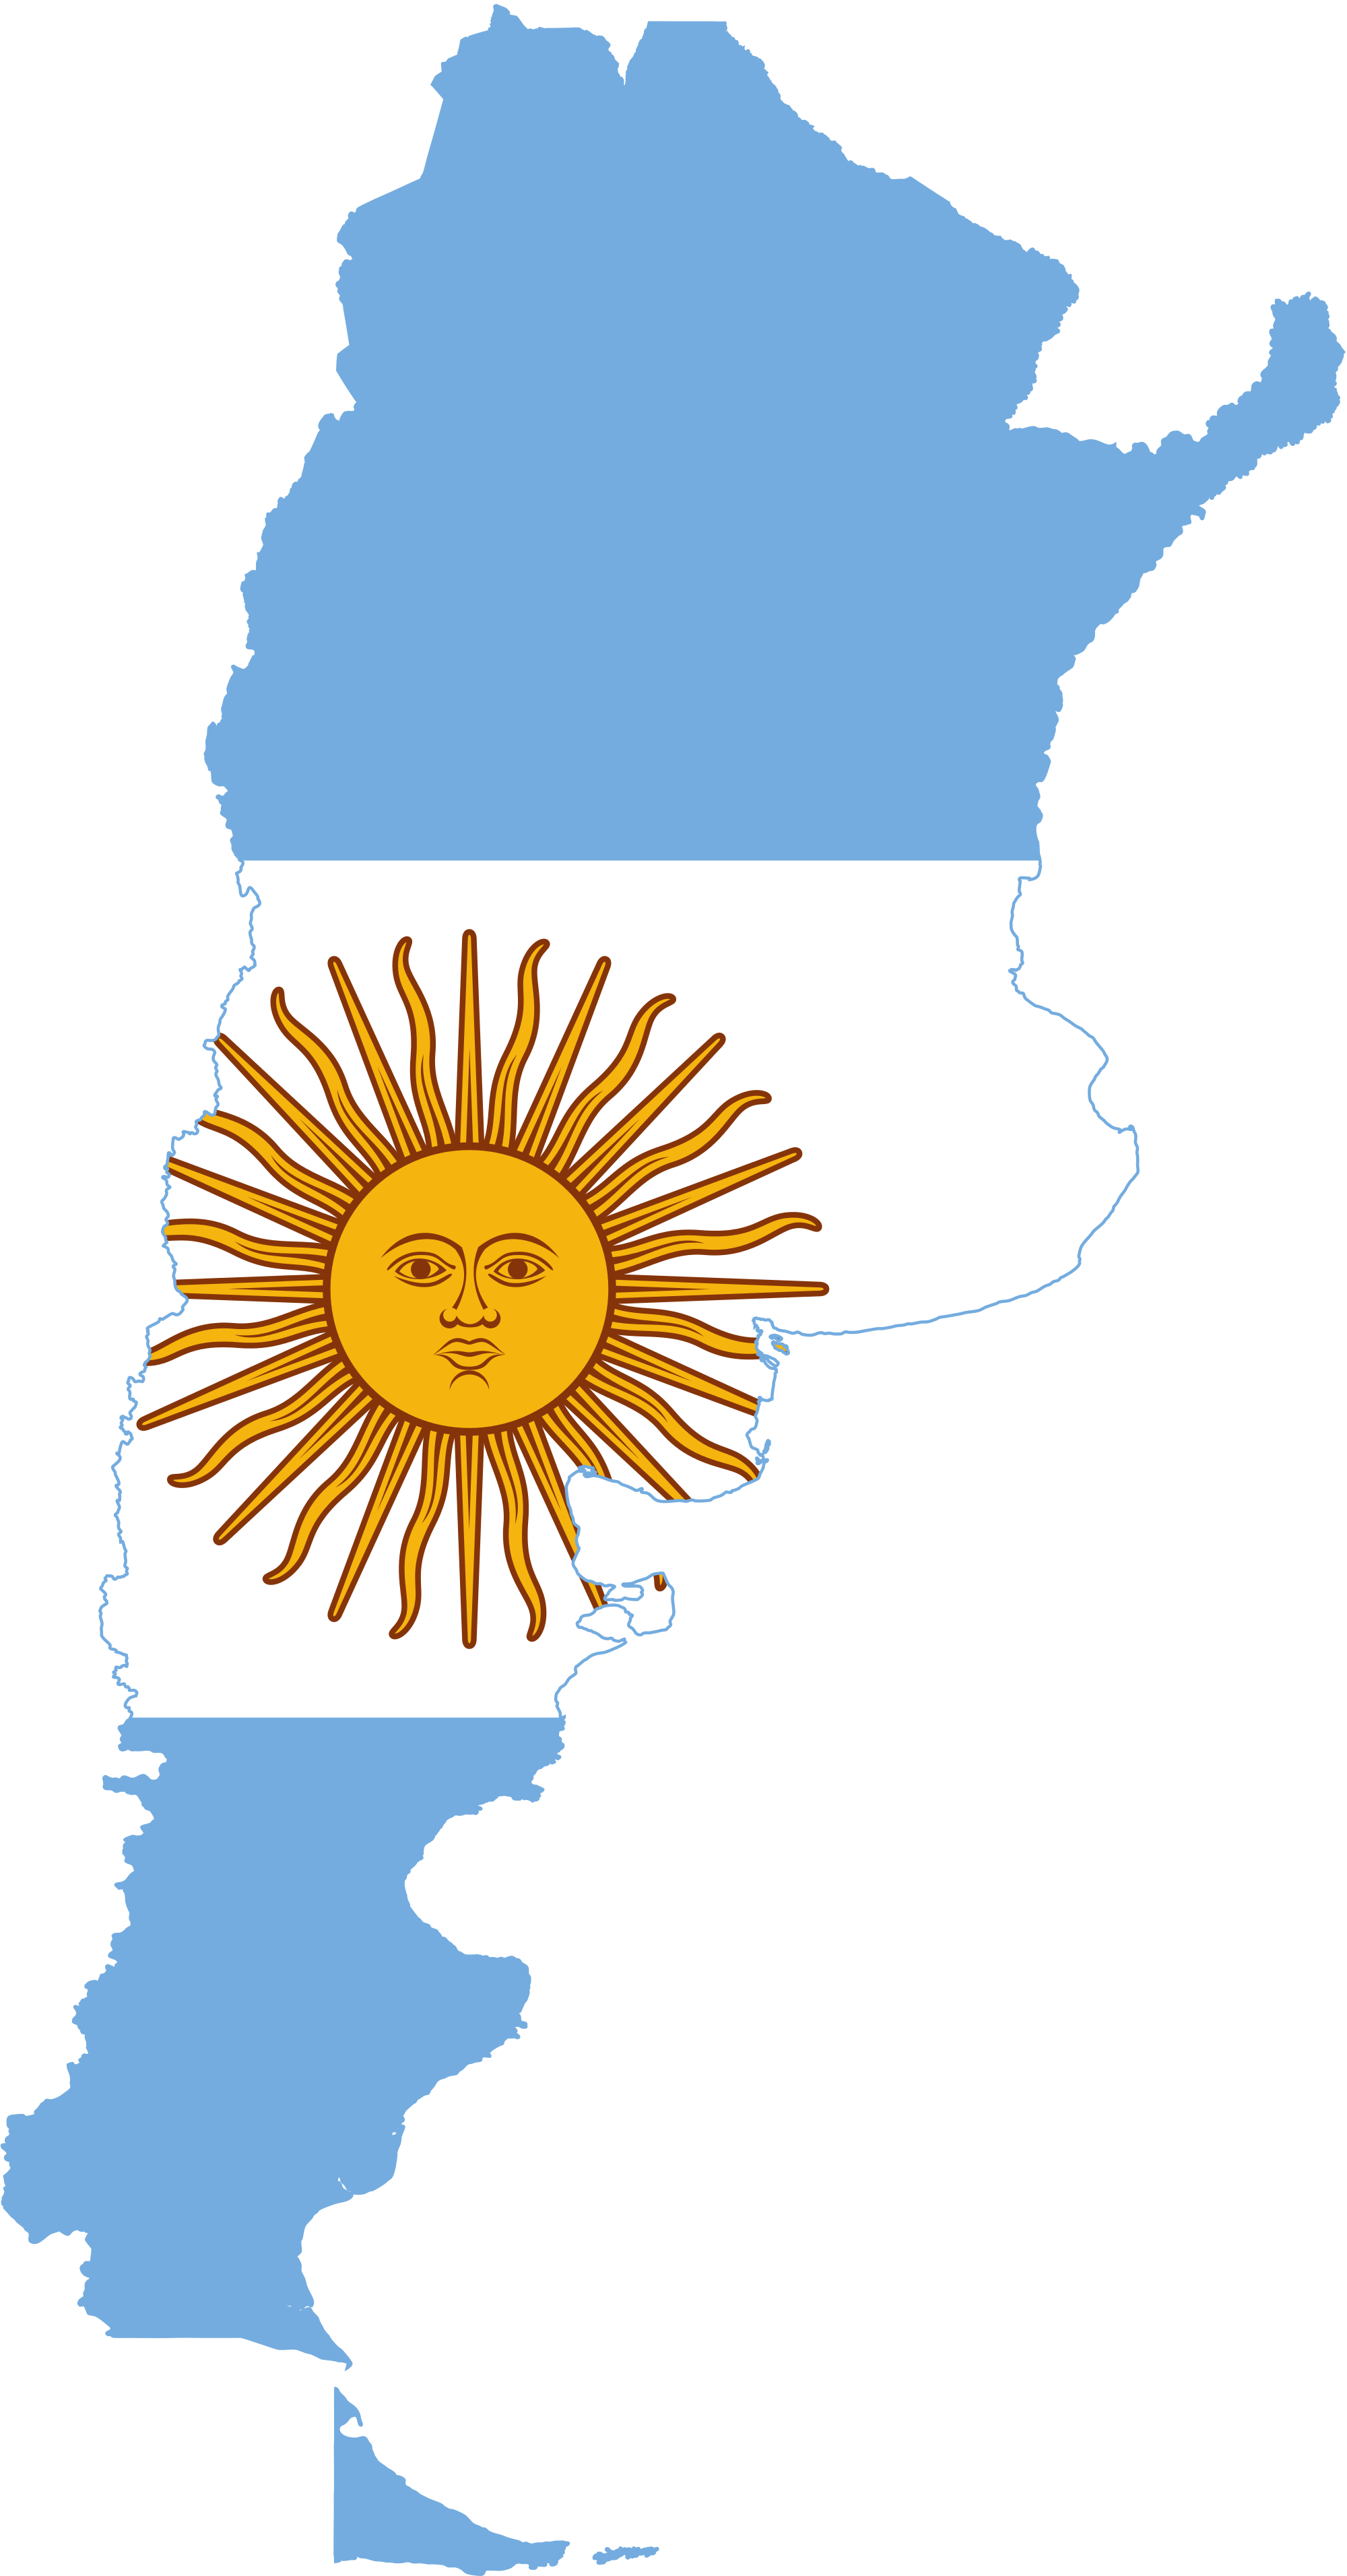 Logo Bandera Argentina.